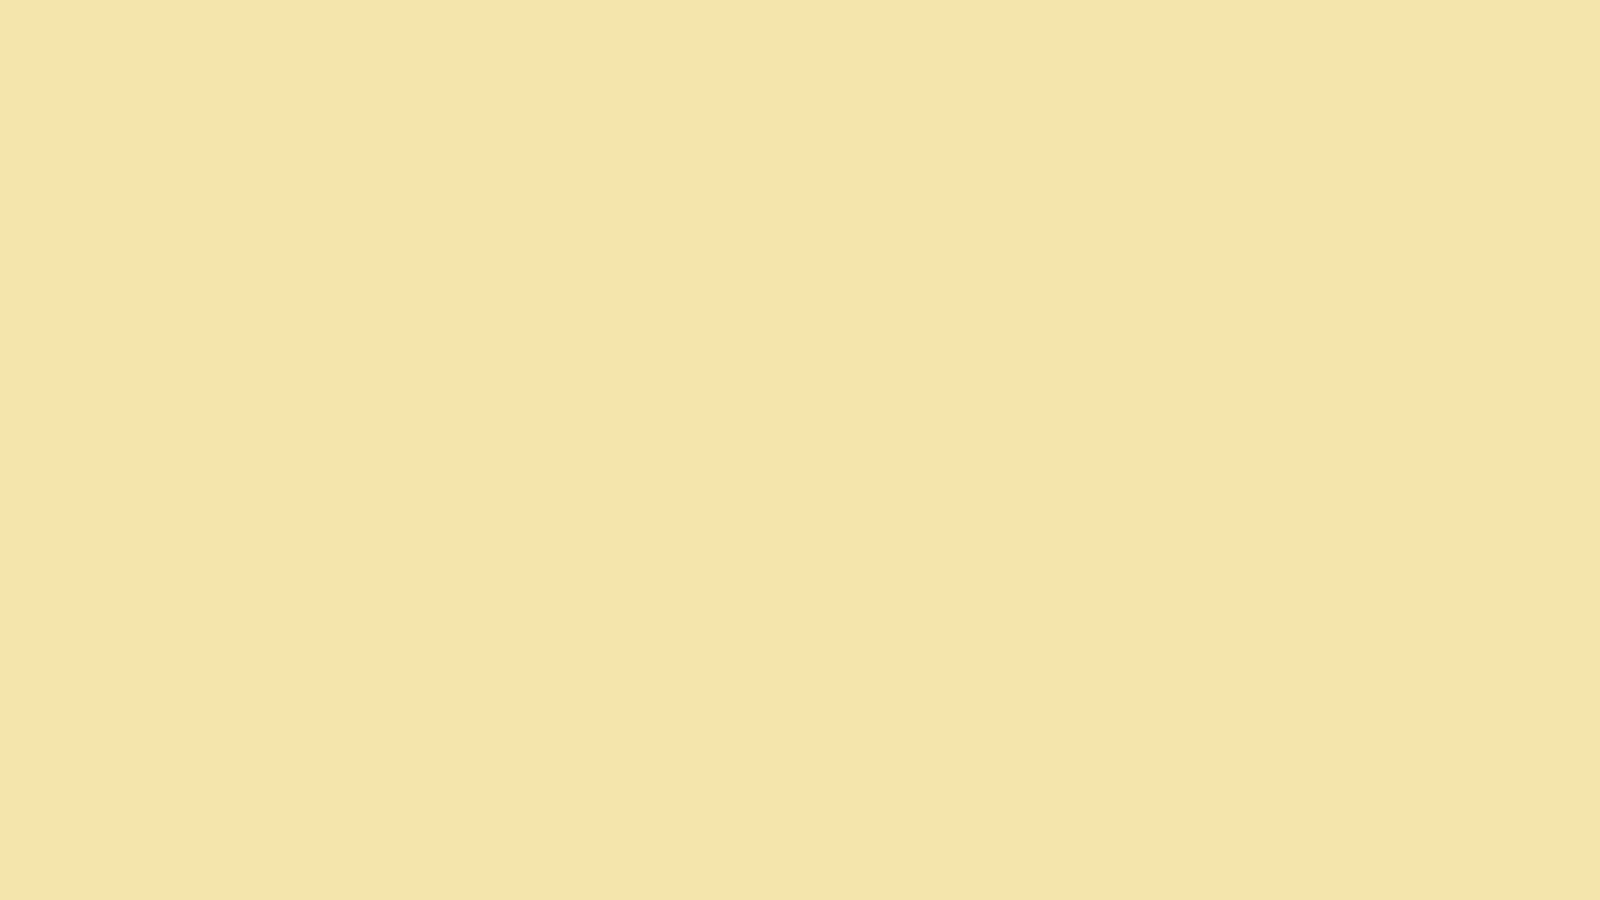 1600x900 Vanilla Solid Color Background